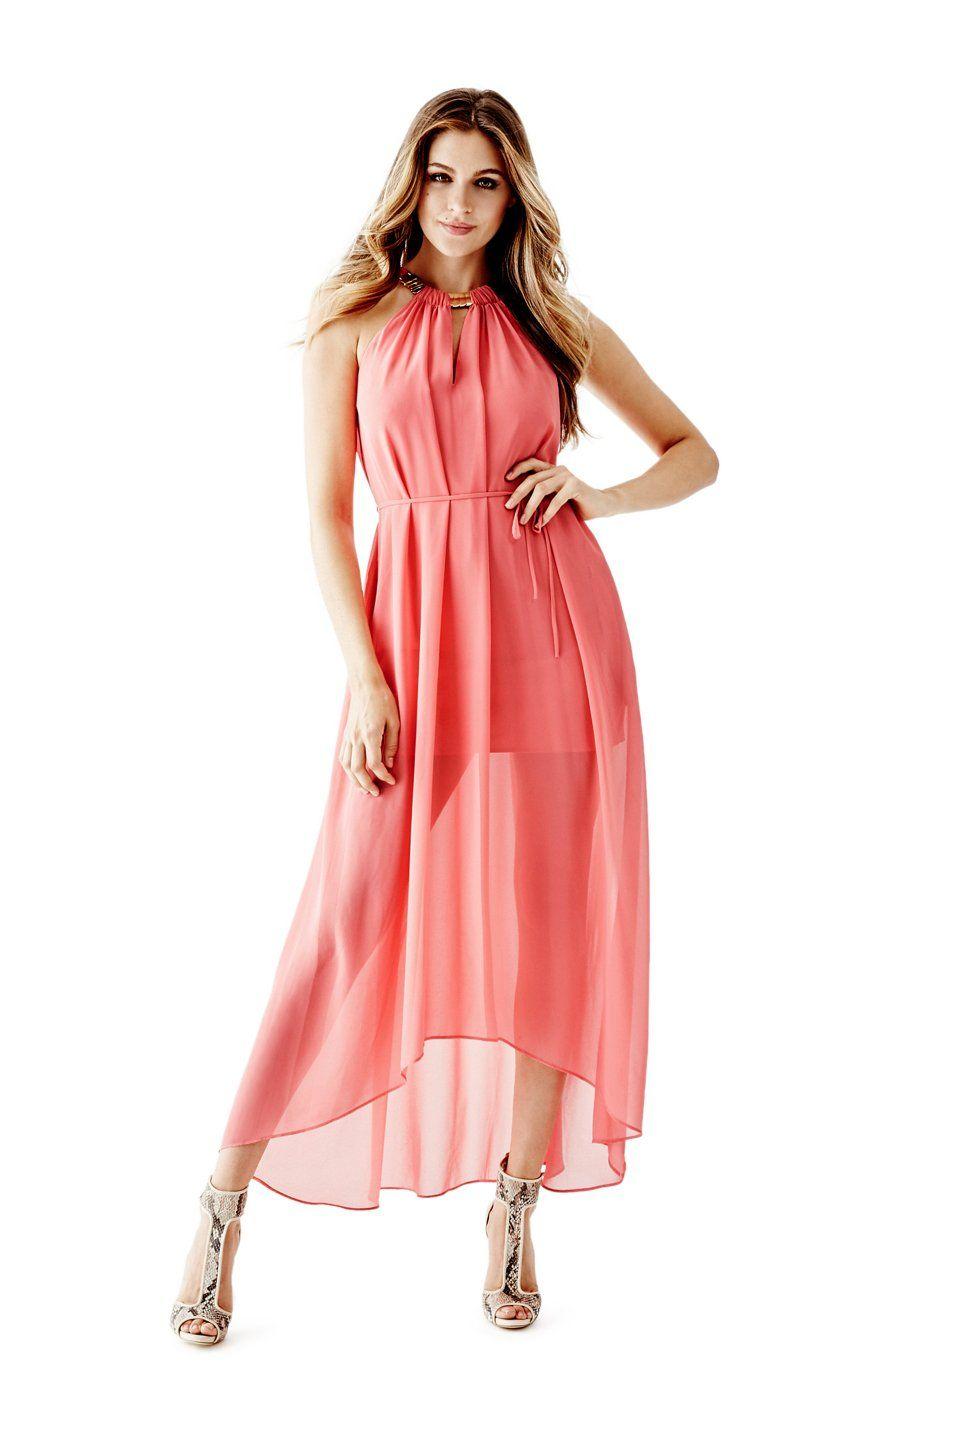 Embellished Halter Maxi Dress | GUESS.com #GUESSResort | GUESS ...